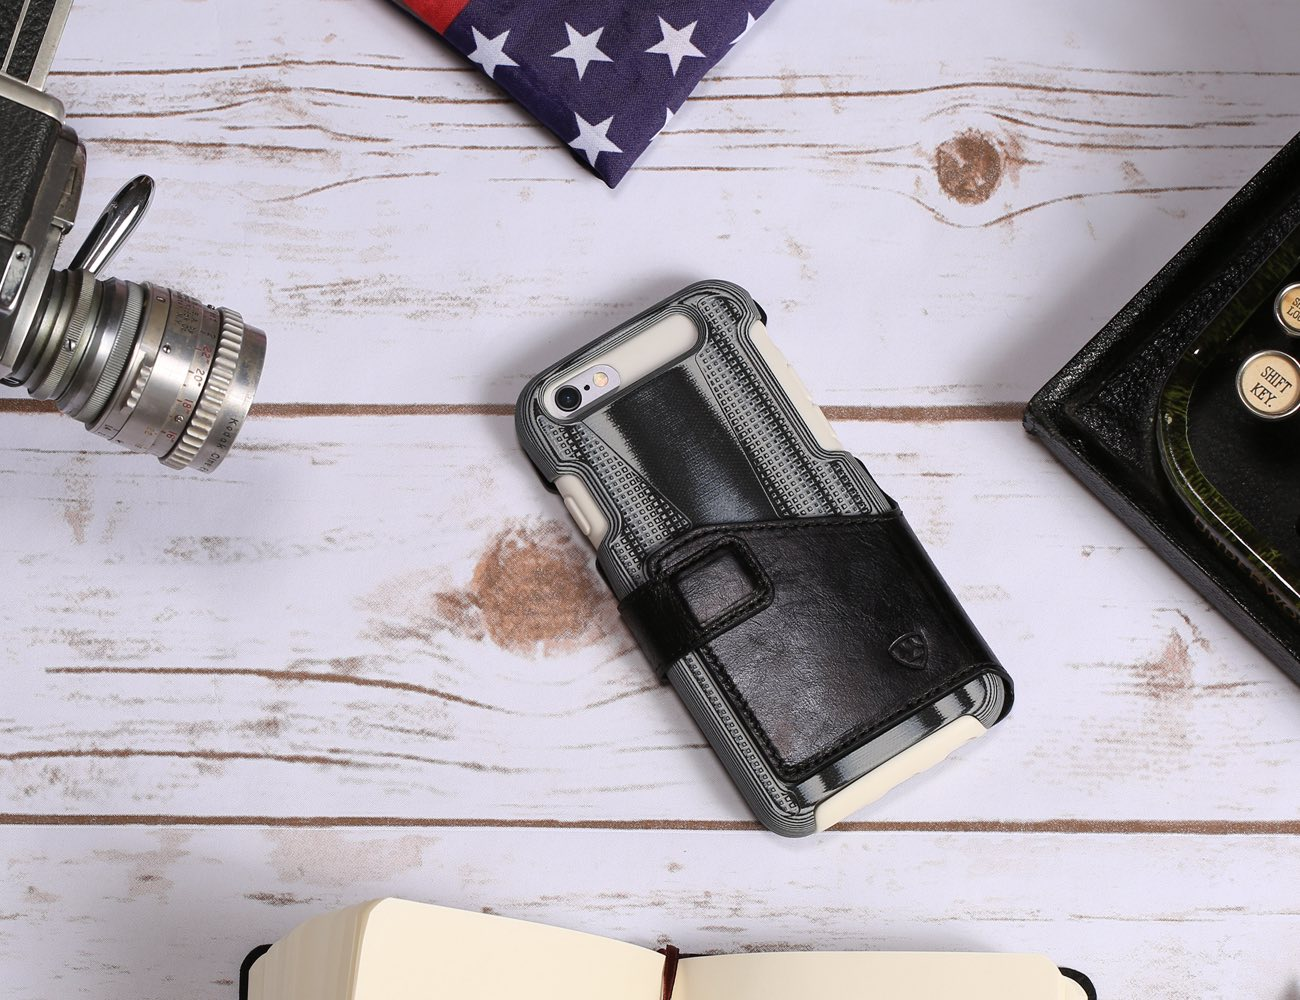 Linen Micarta Carbon Fiber and G10 Phone Case